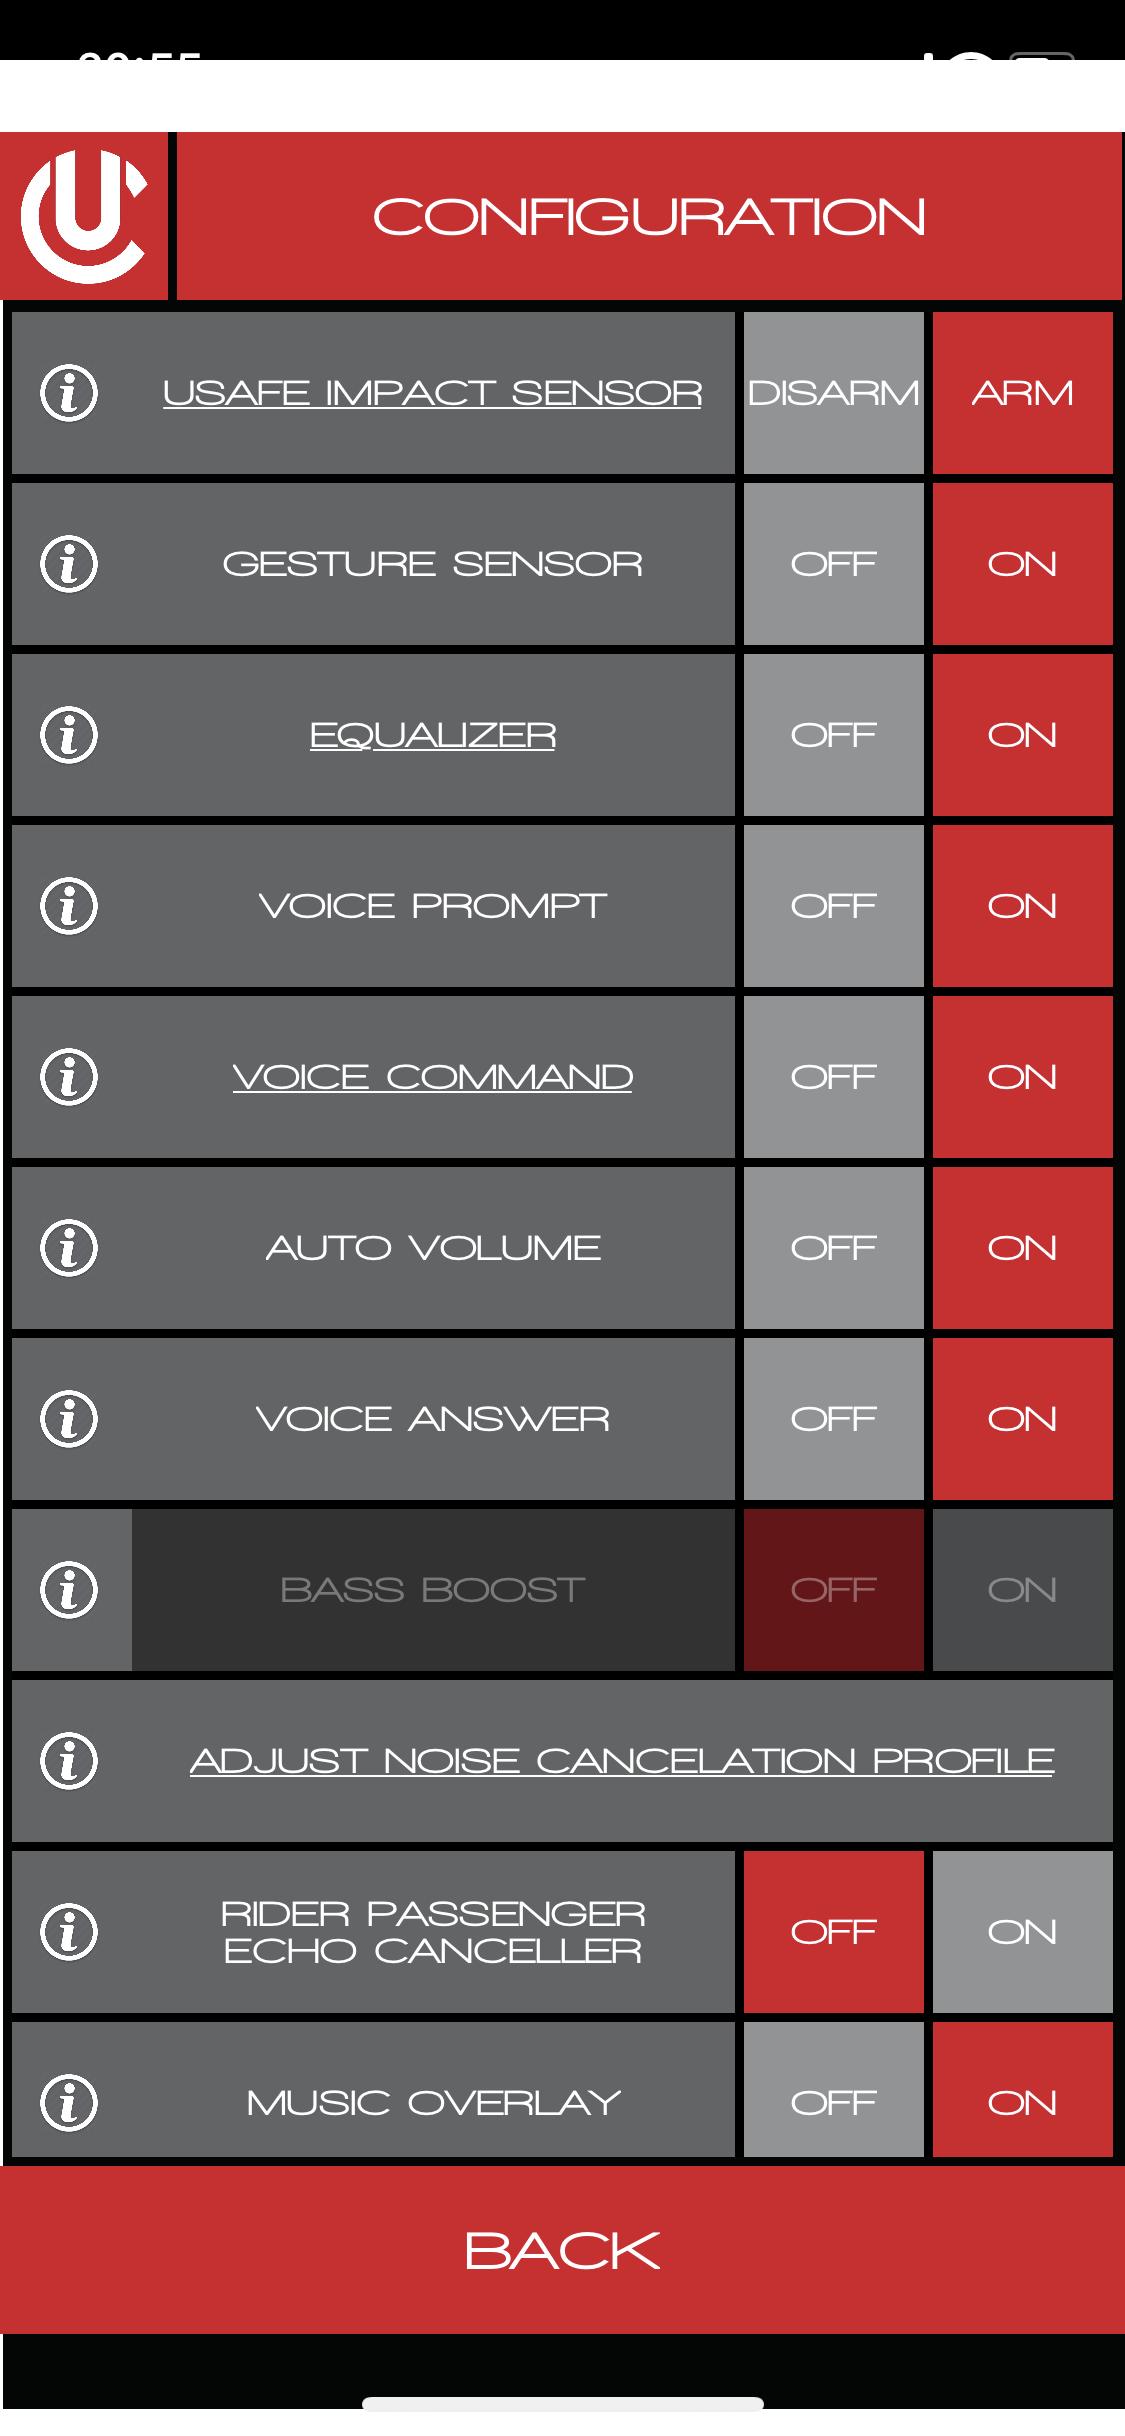 CLEARLink-Configurationh1GPujP0uPalj